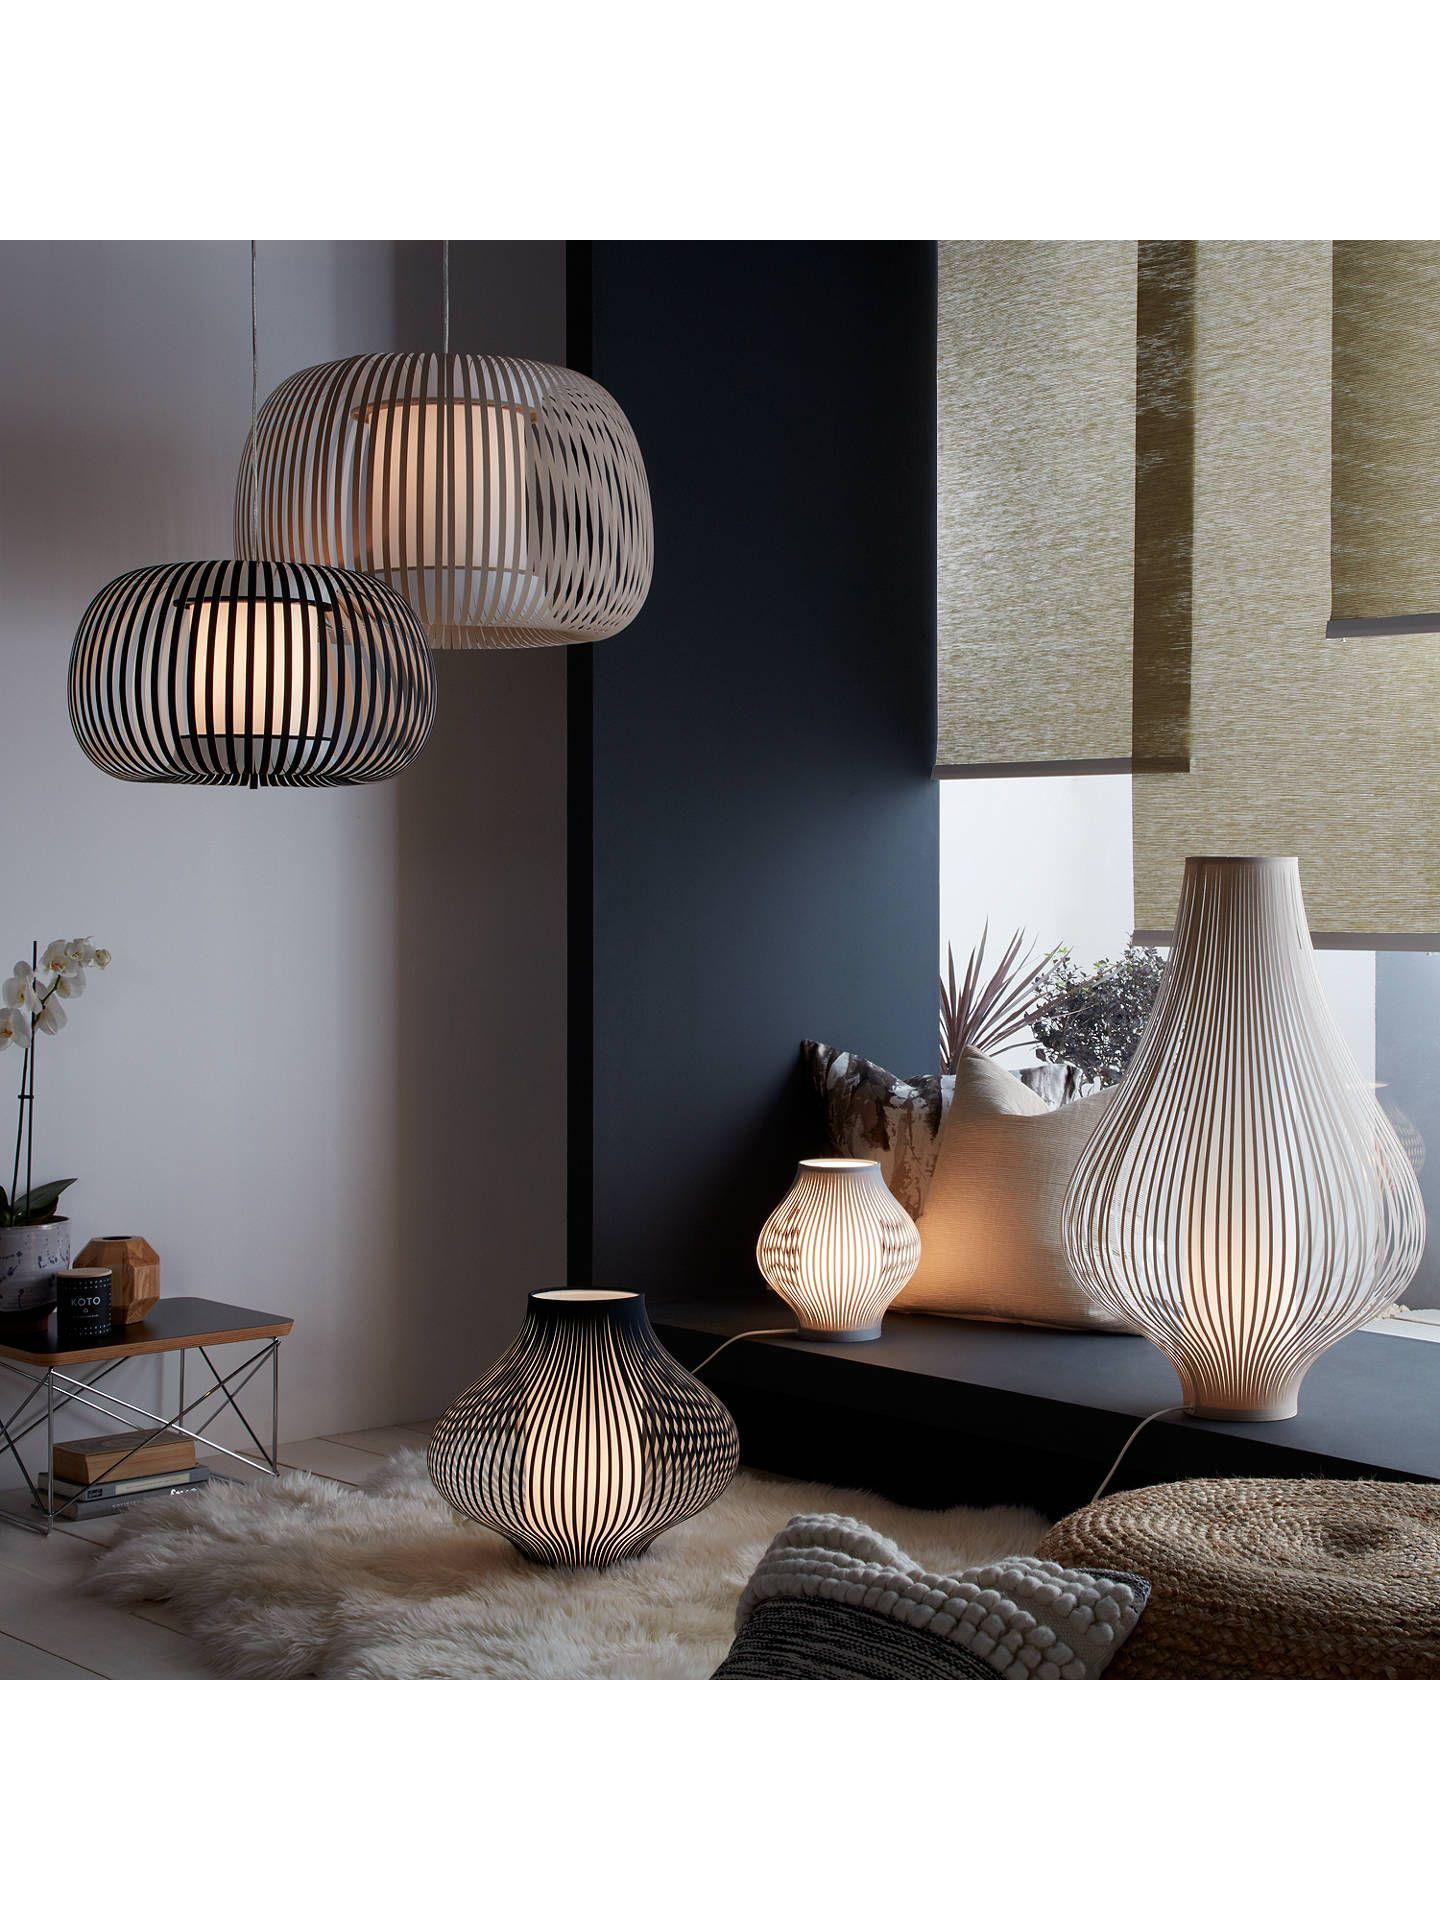 John Lewis Partners Harmony Large Ribbon Ceiling Light Black En 2020 Luminaires Salle A Manger Deco Maison Deco Salon